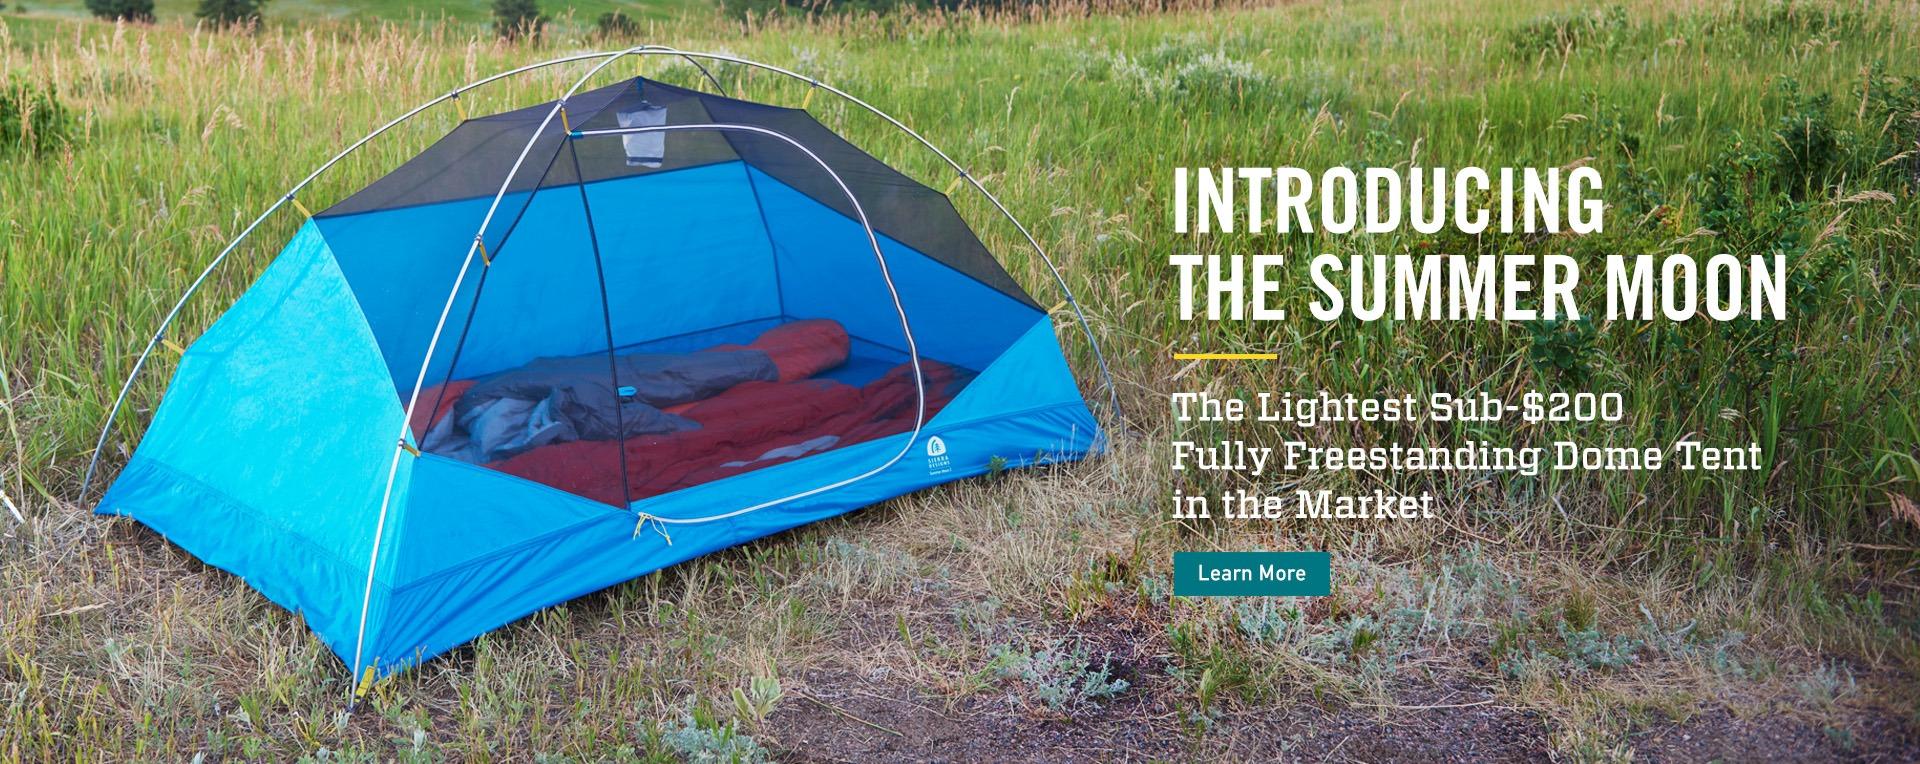 New Summer Moon Tent